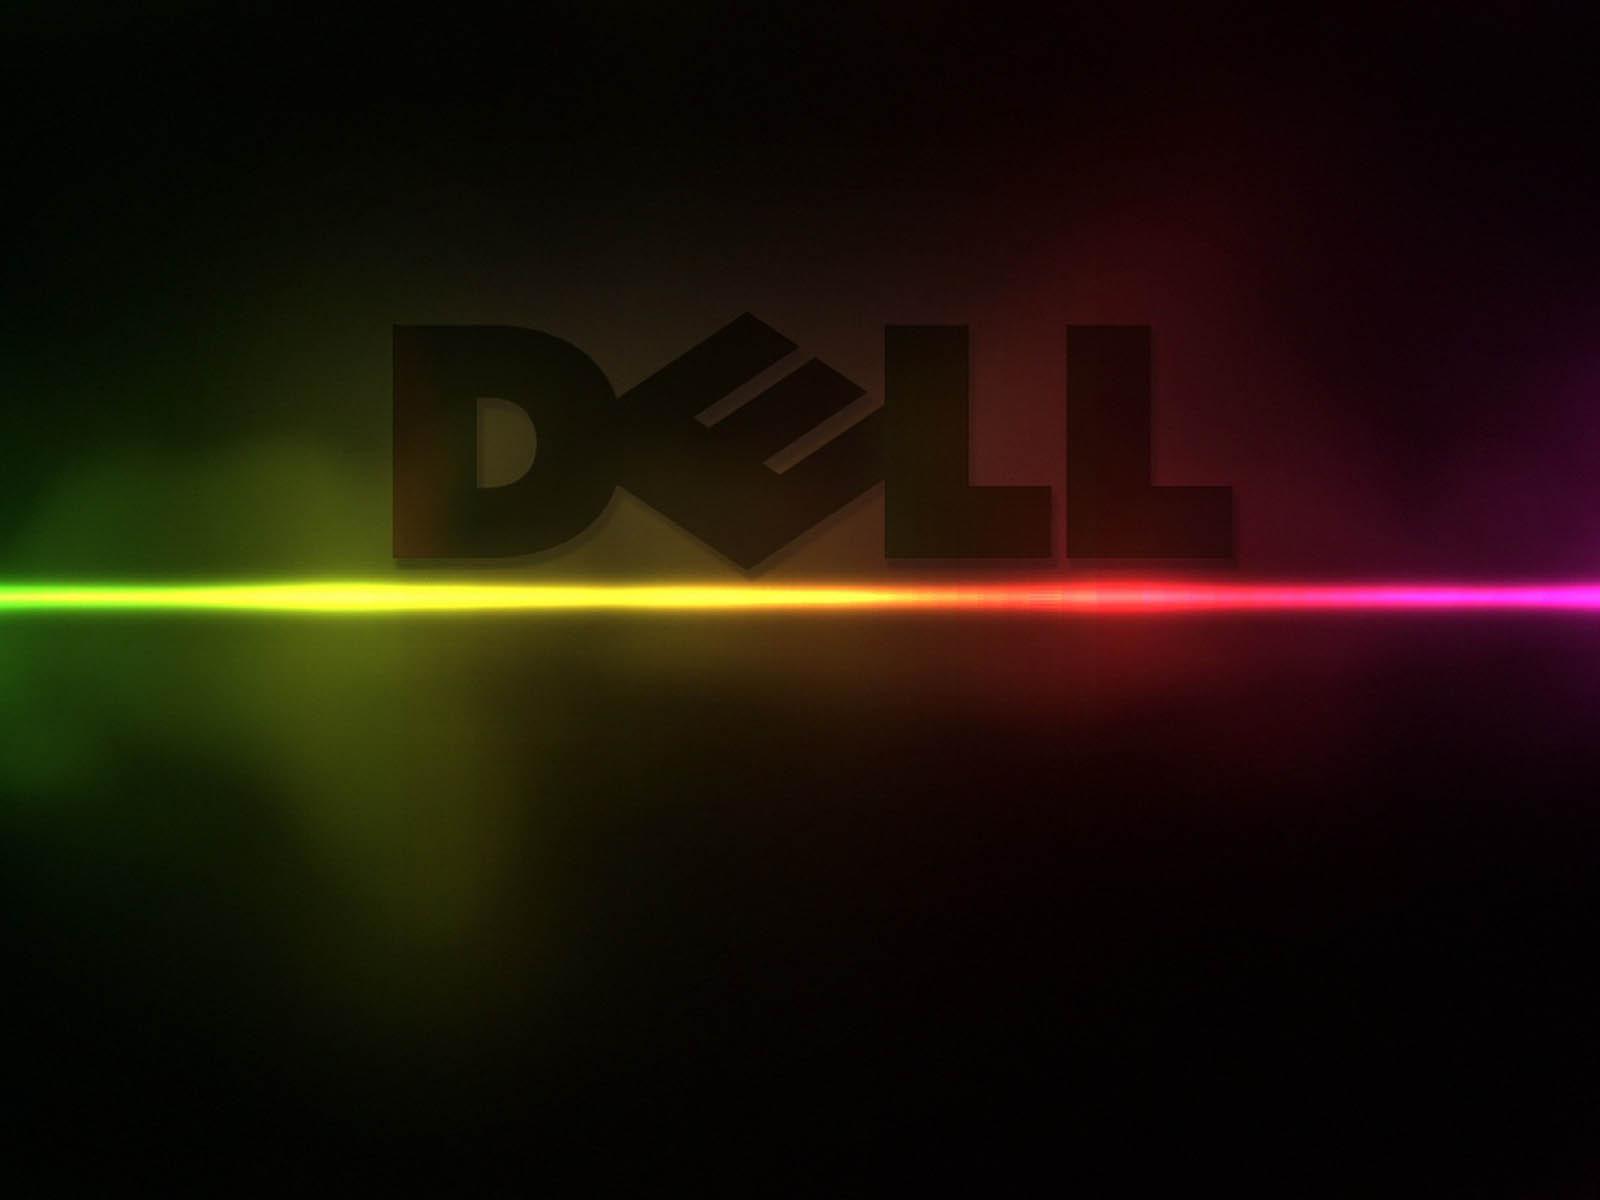 Dell Desktop Backgrounds Wallpaper 1600x1200 1600x1200